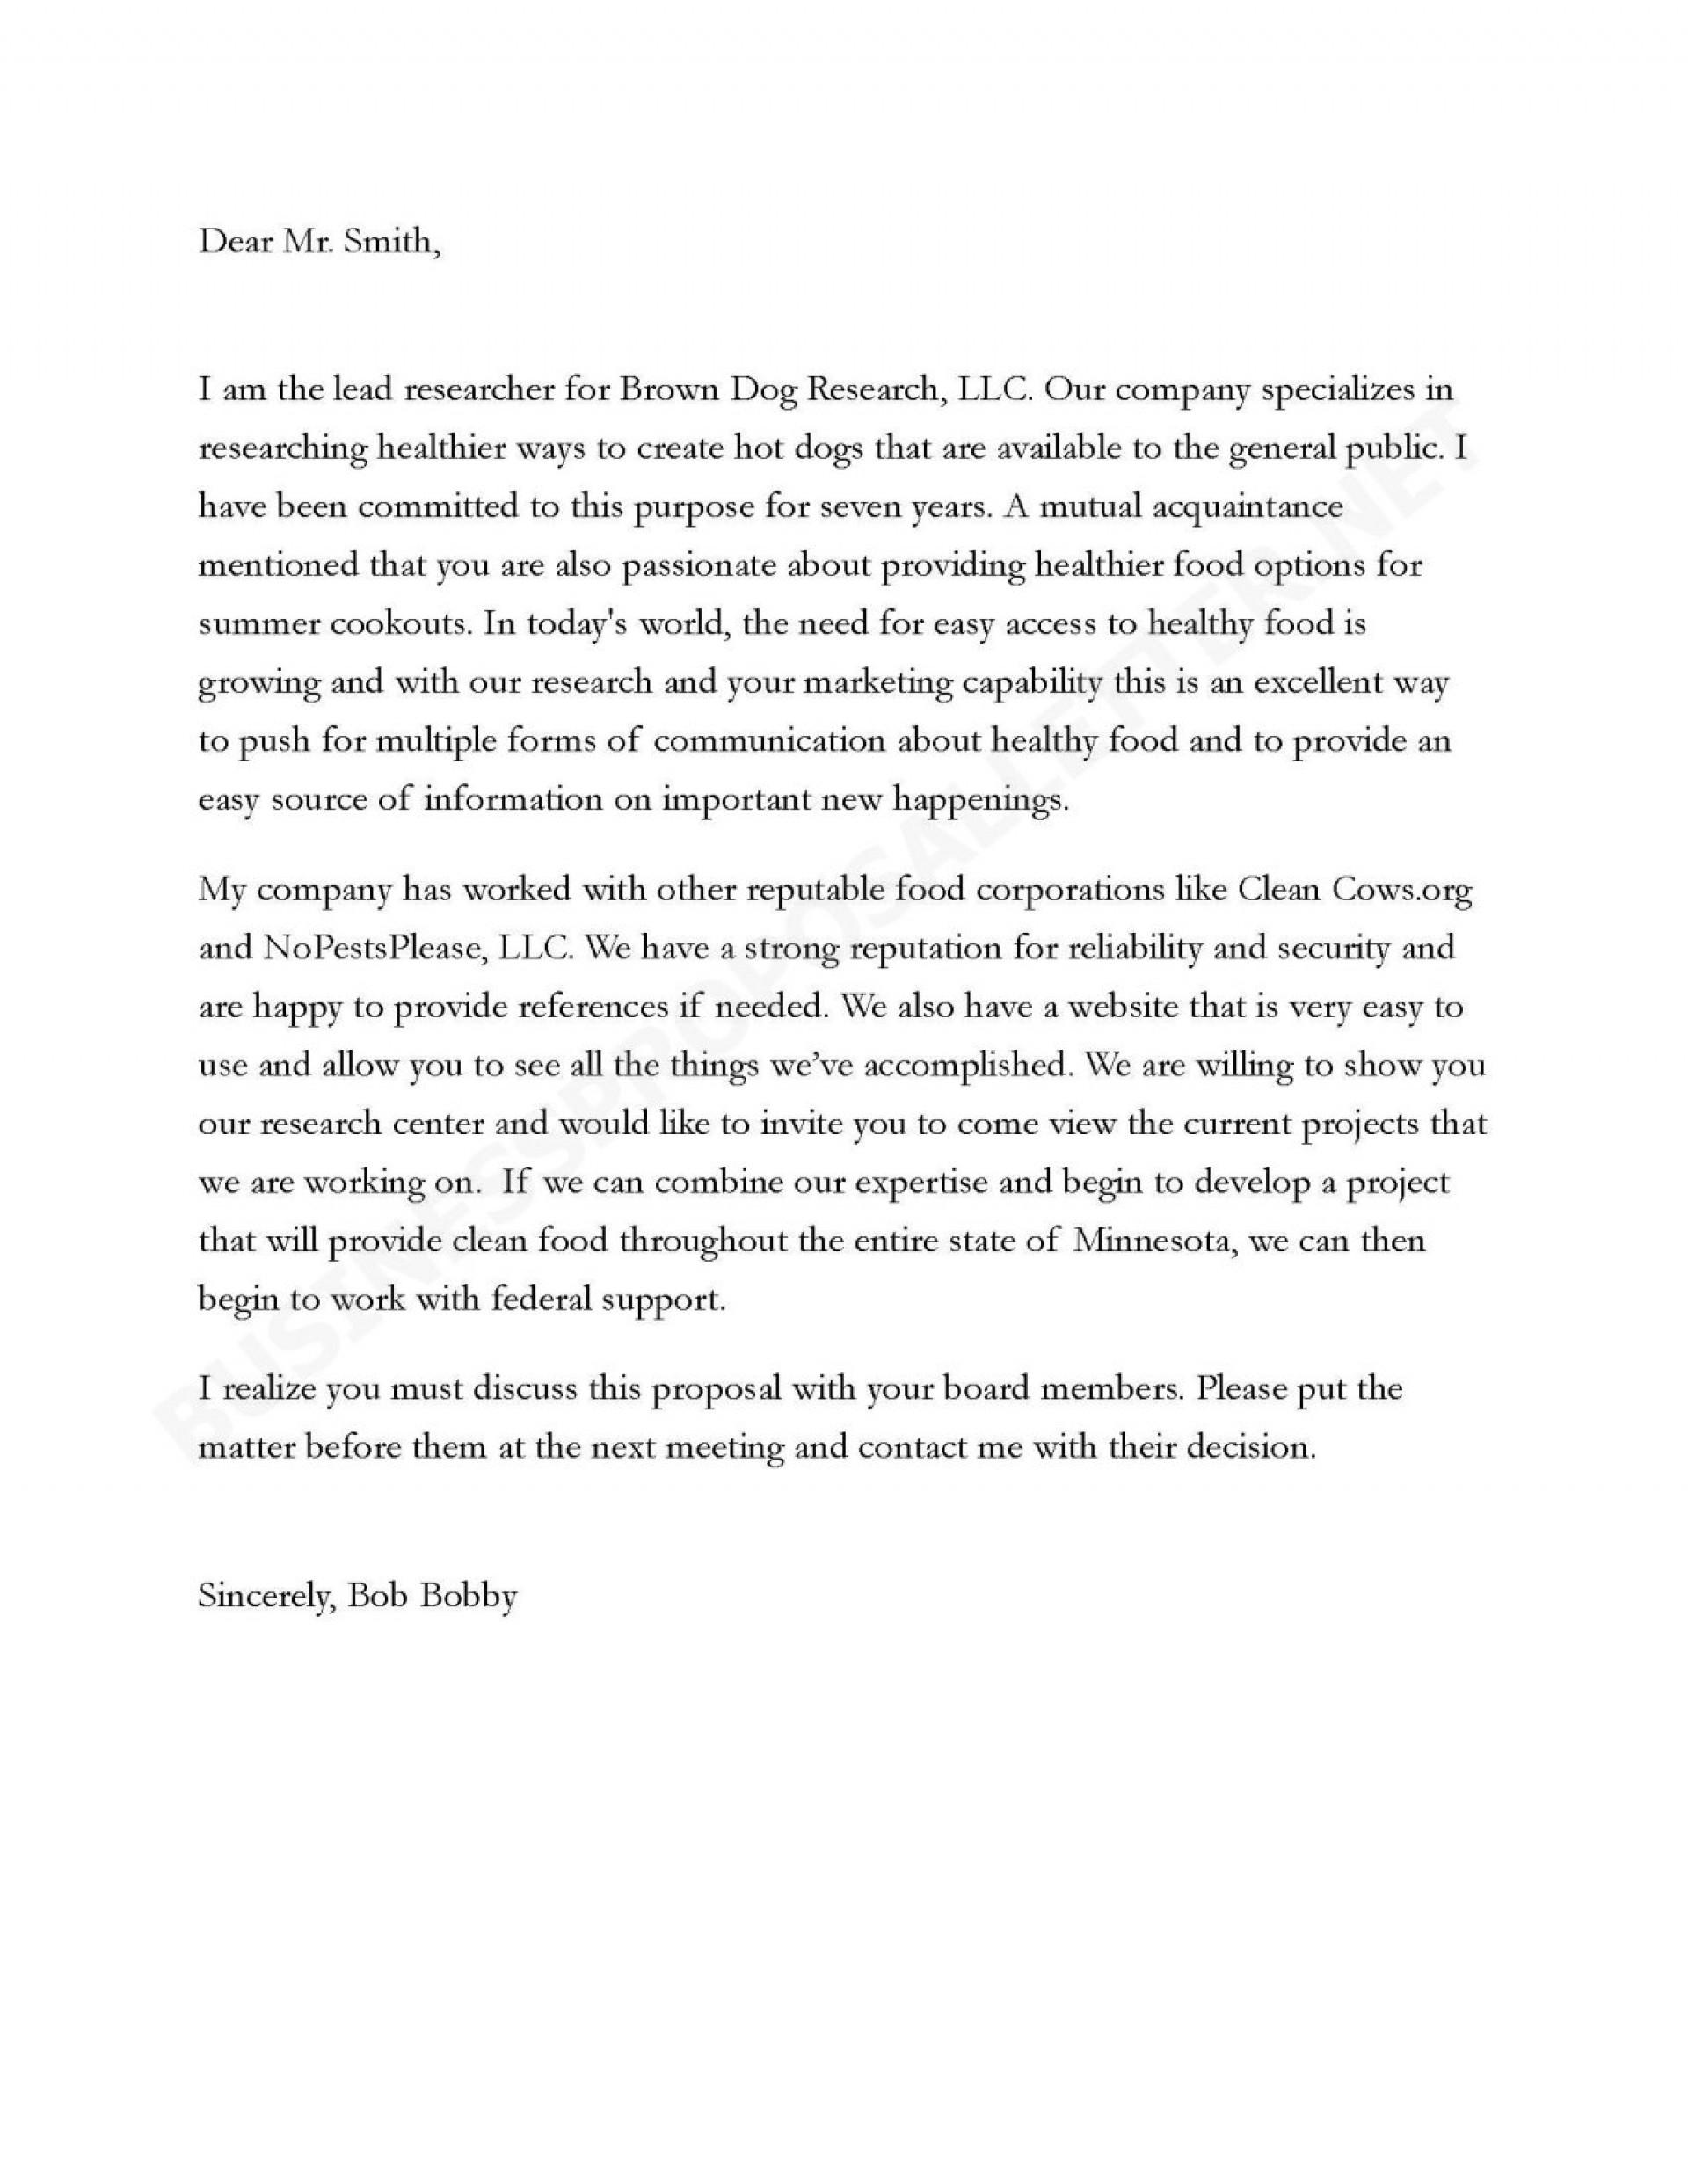 002 Should Students Wear School Uniformssay In Thesis Statement Persuasive Have To Business Proposal Letter S Conclusion Not All Teachers Uniform Opinion Impressive Uniforms Essay Ielts Sample 1920